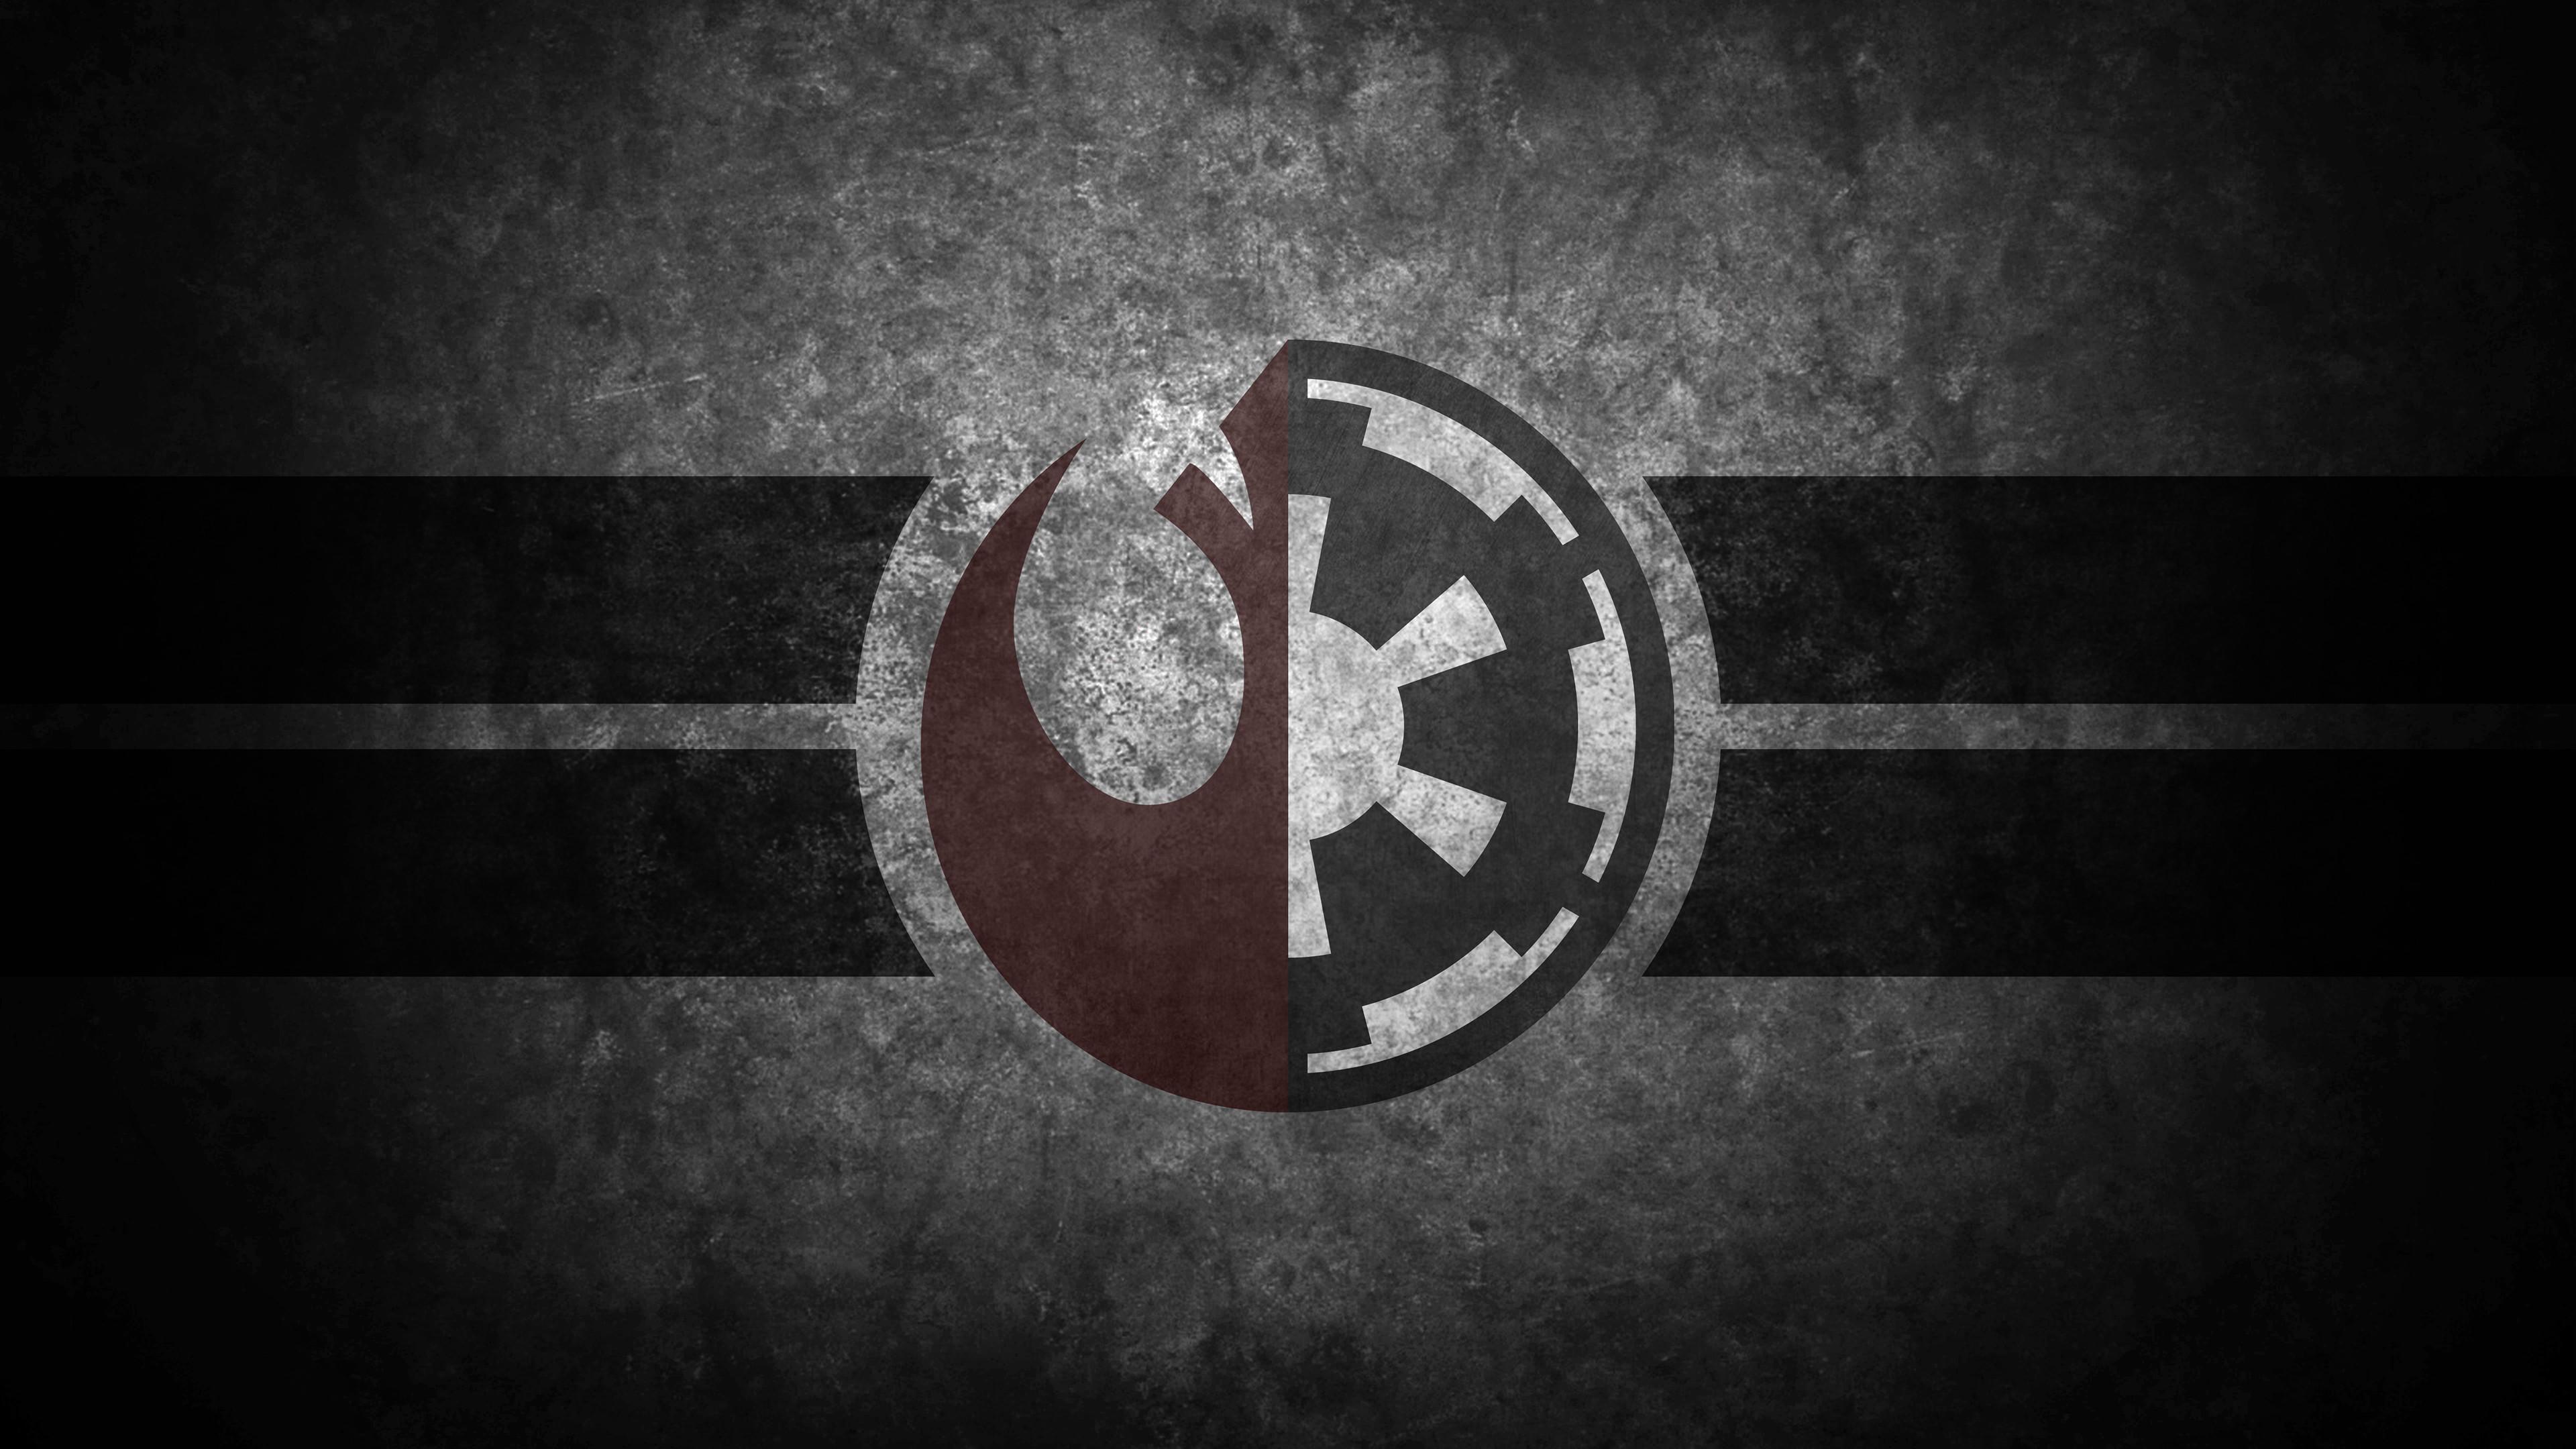 Res: 3840x2160, Star Wars Divided Allegiance Desktop Wallpaper by swmand4